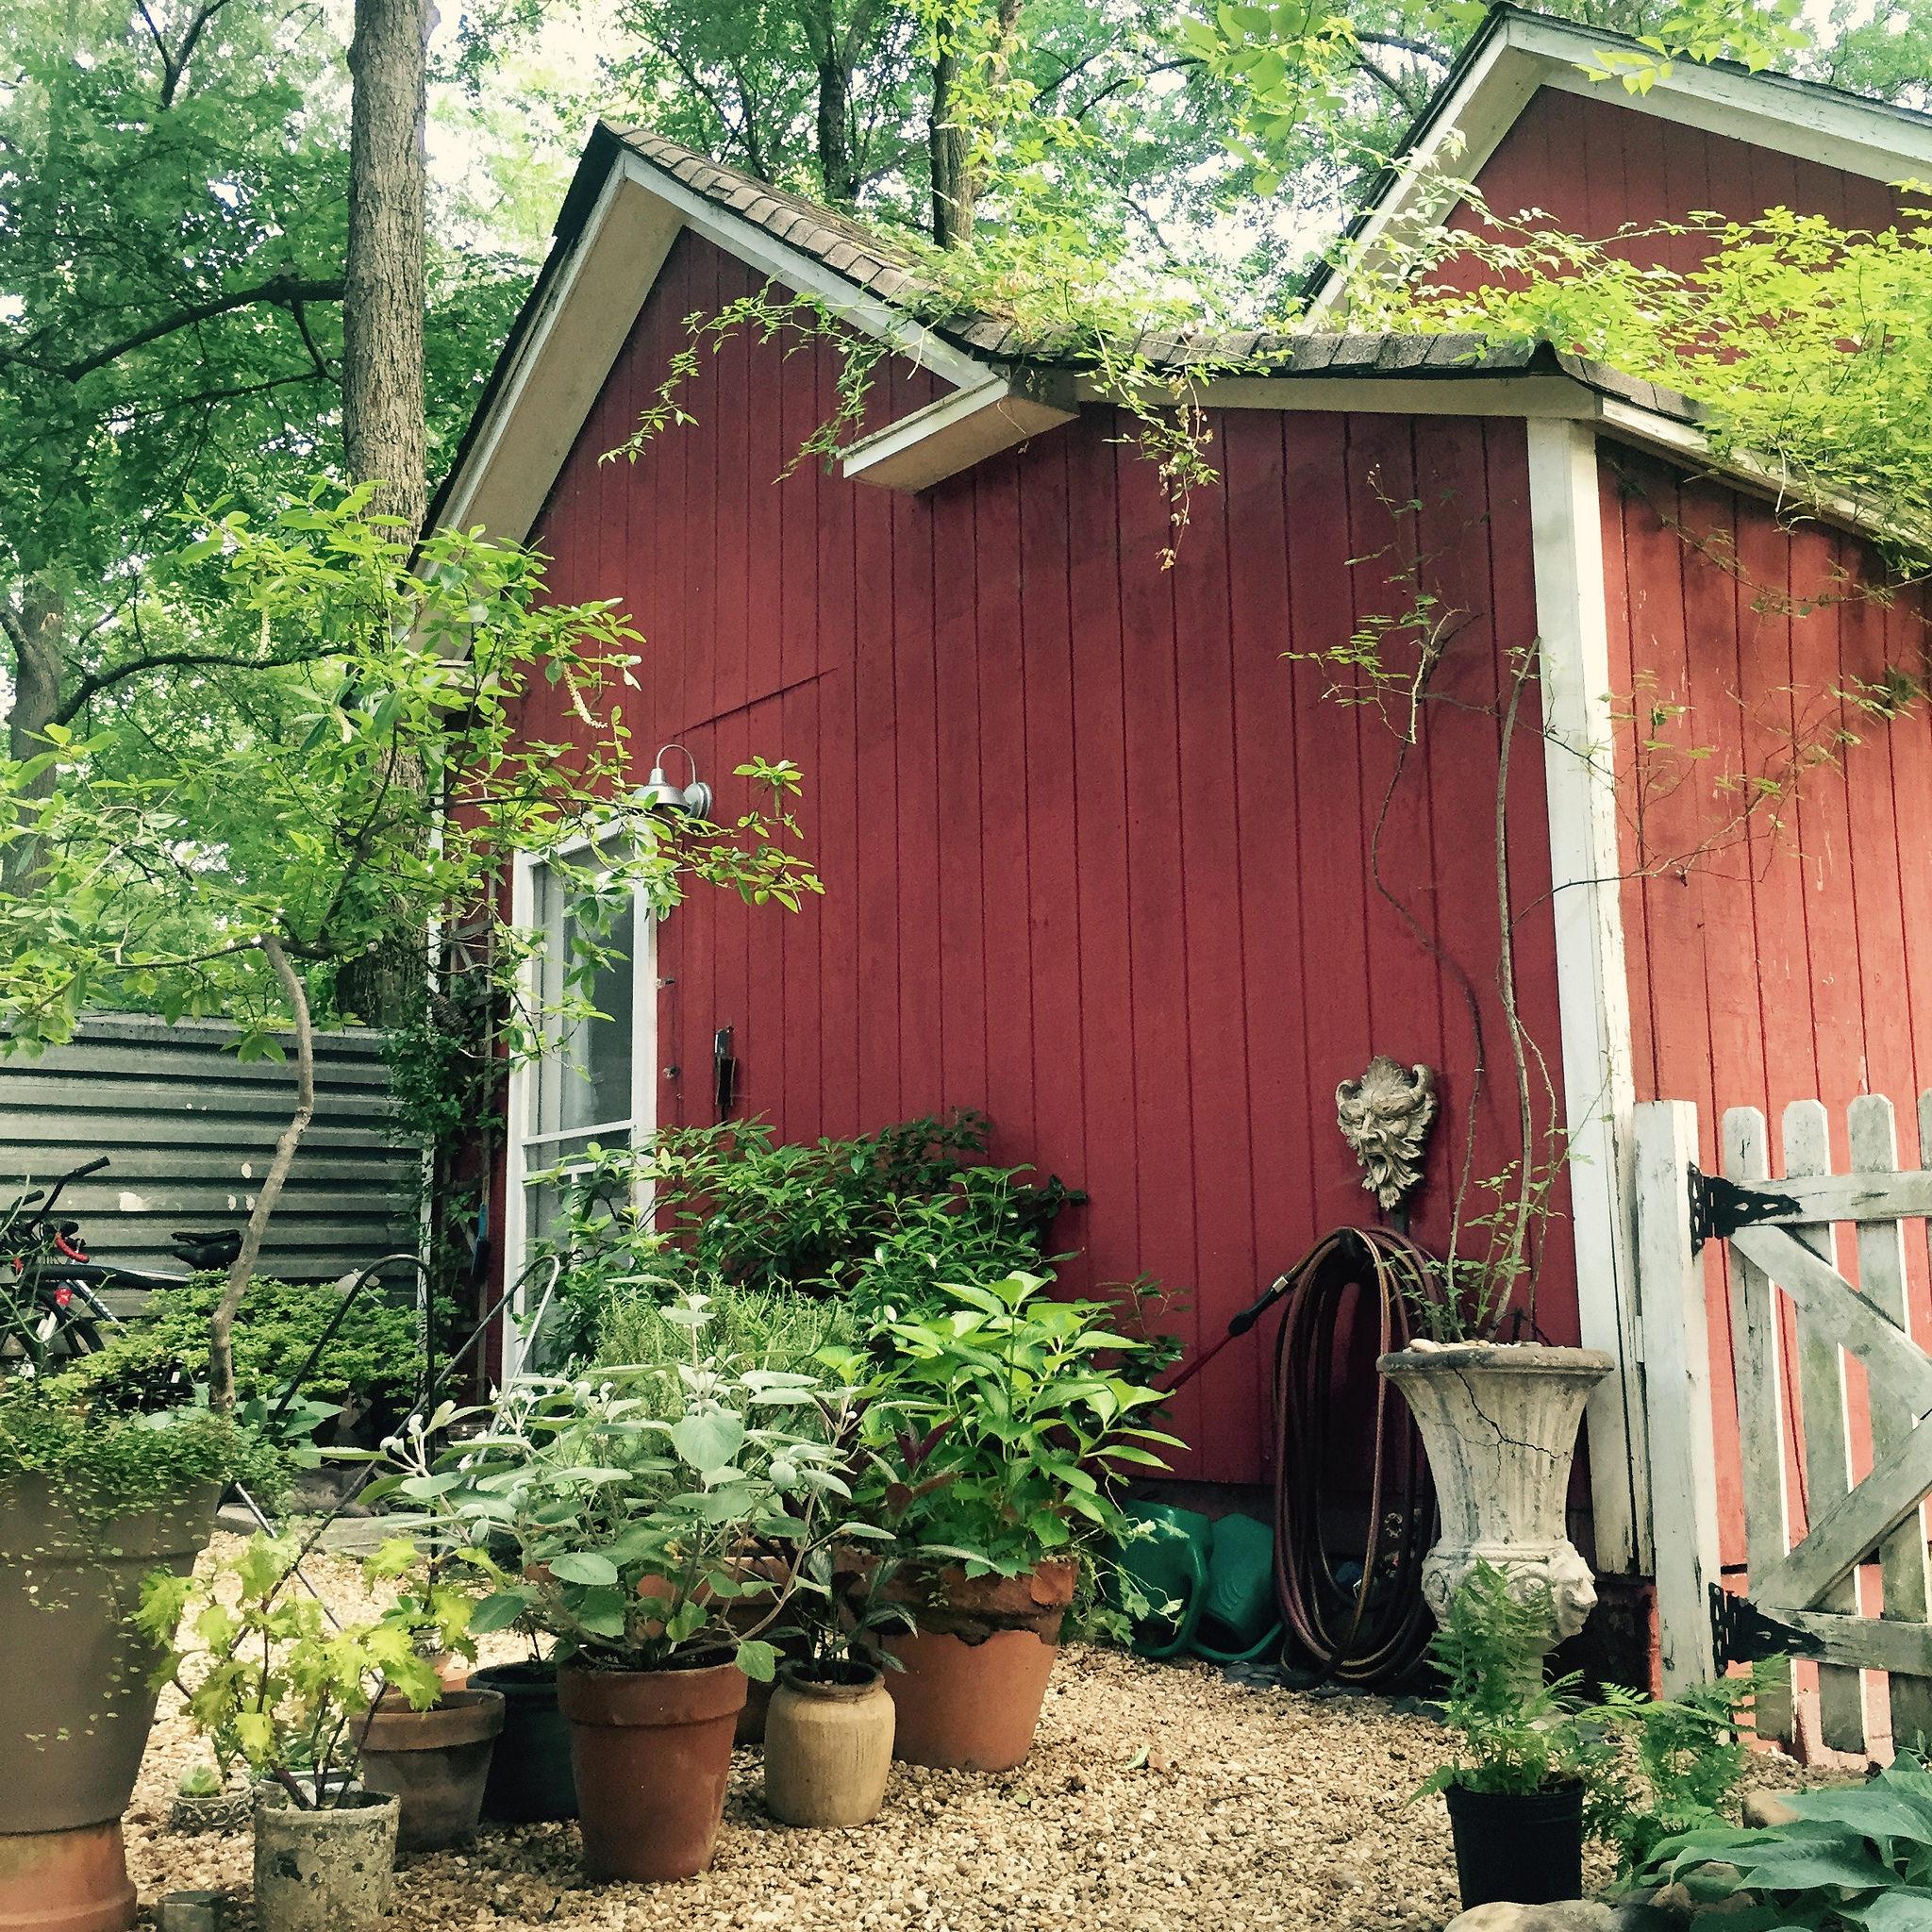 Teri's House